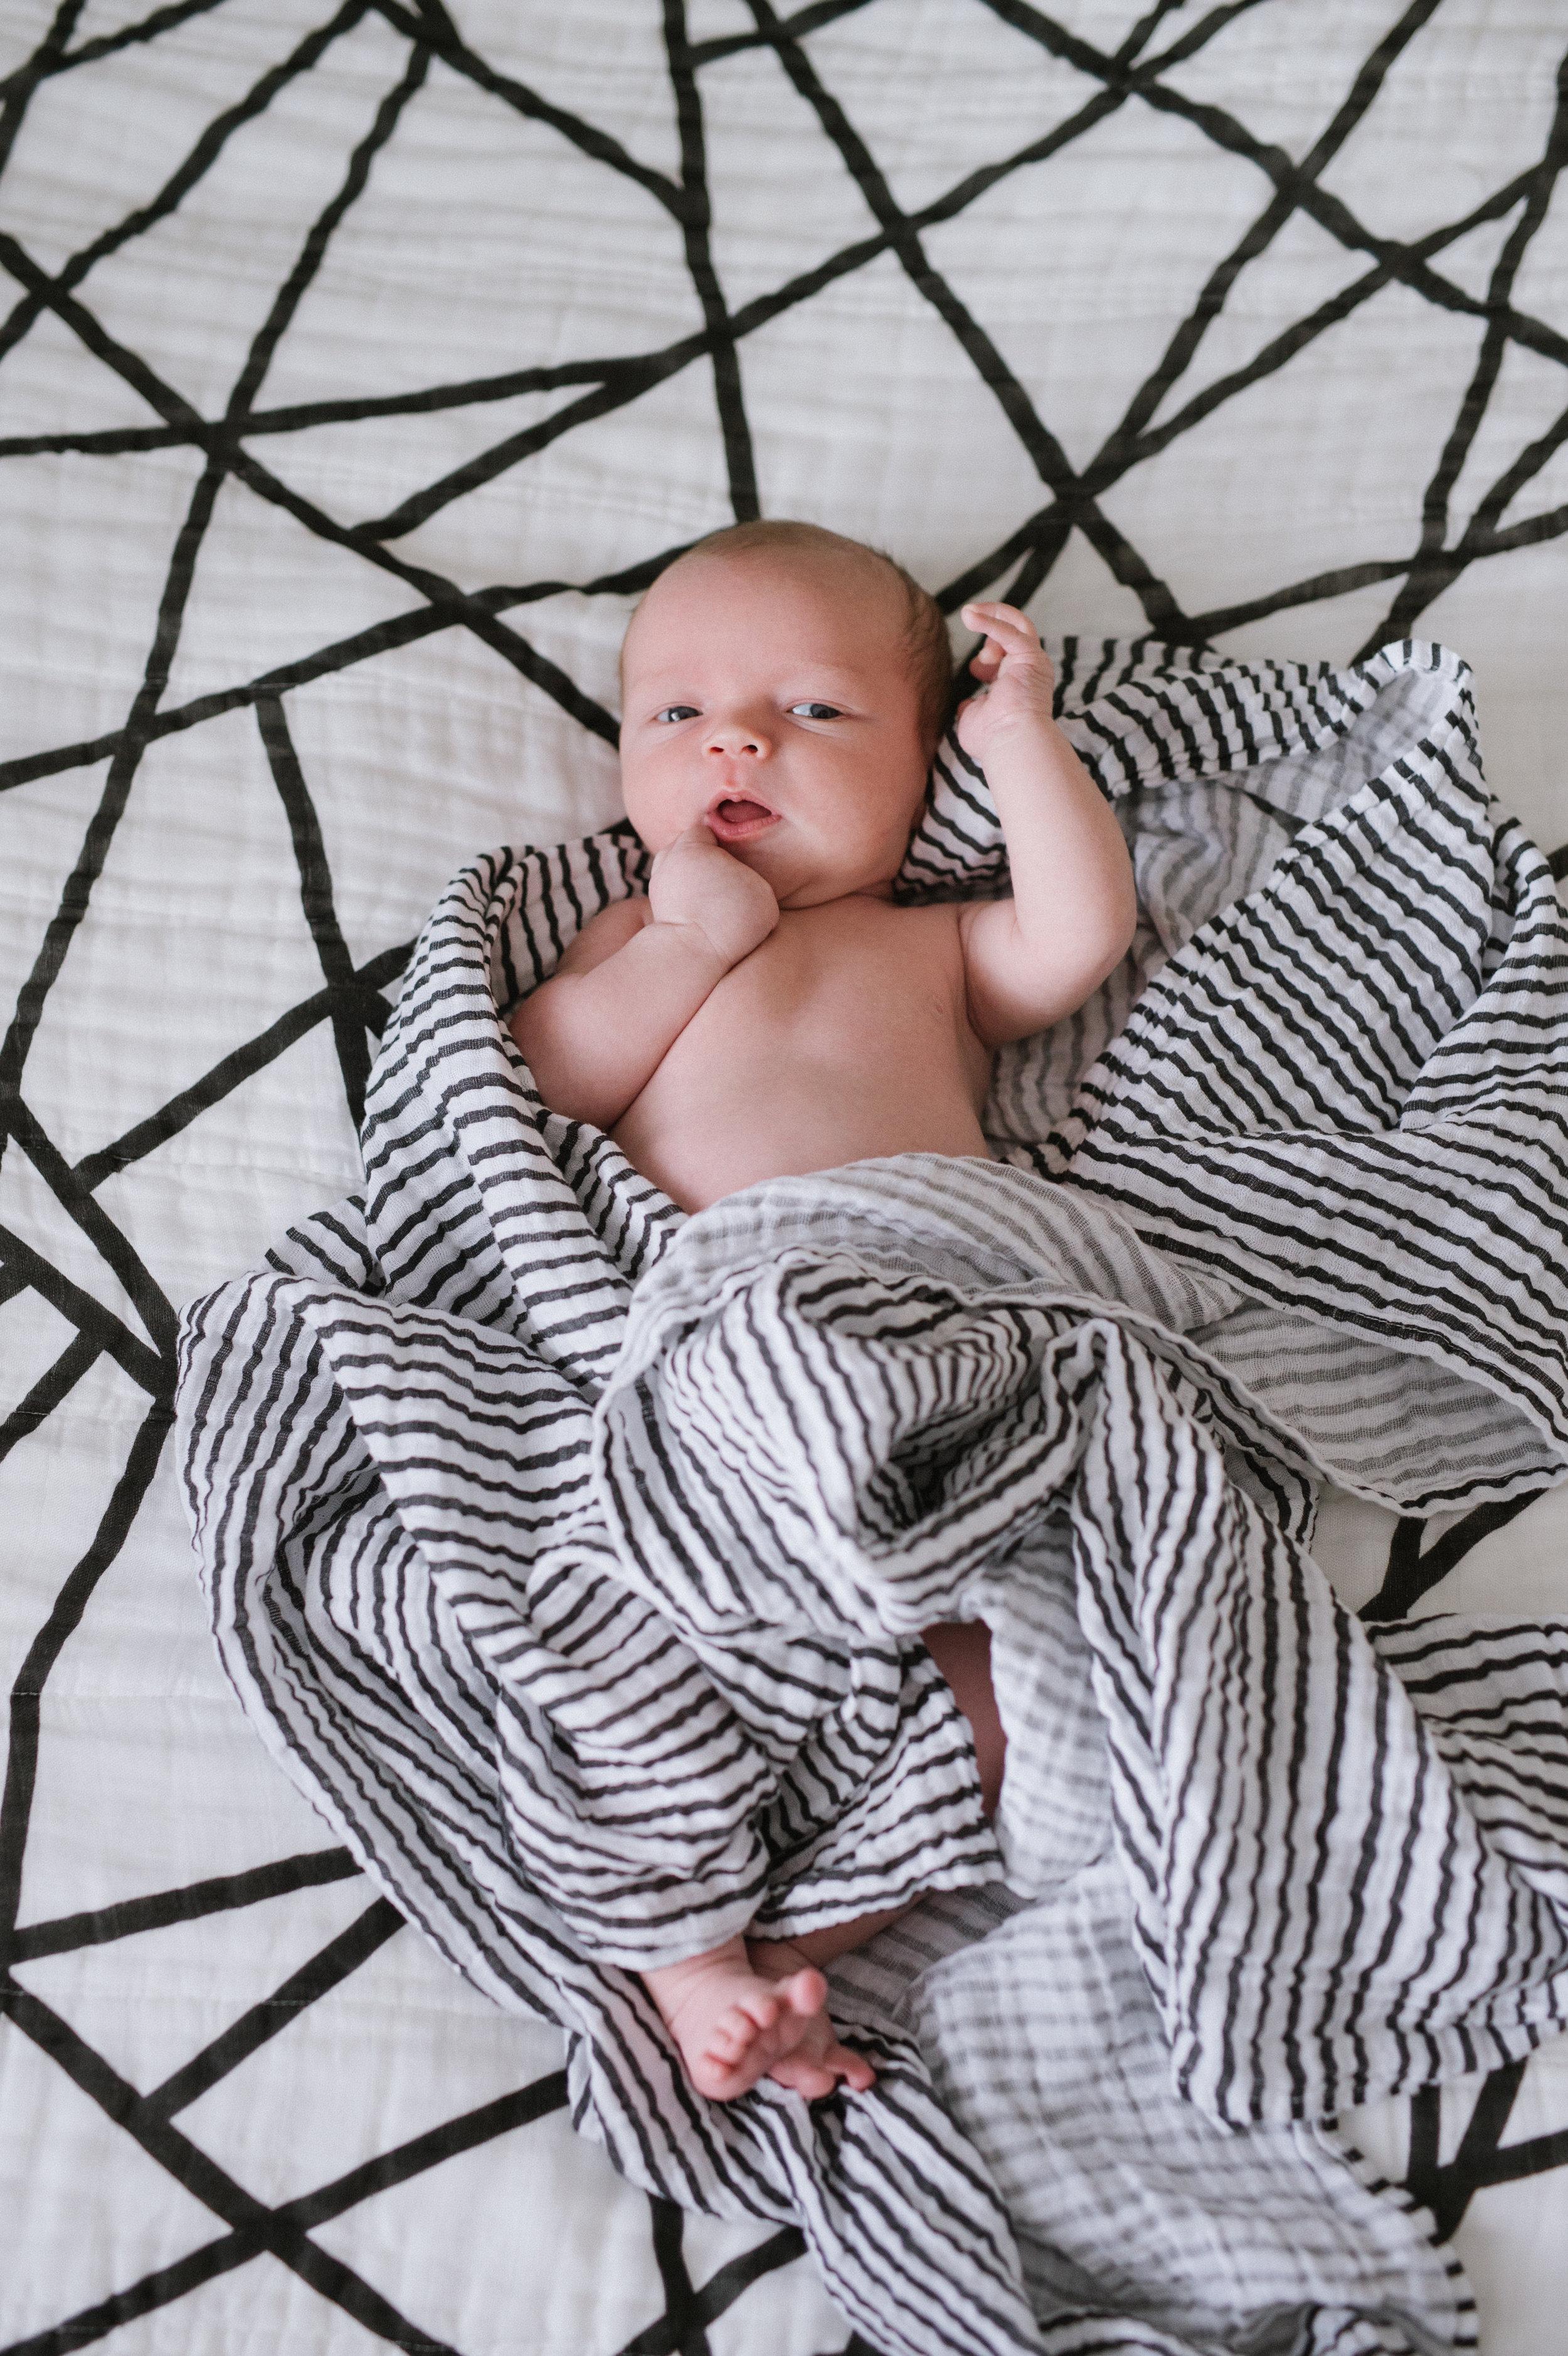 Calgary_Family_Photography_Newborn_Hart_2018_HR053.jpg